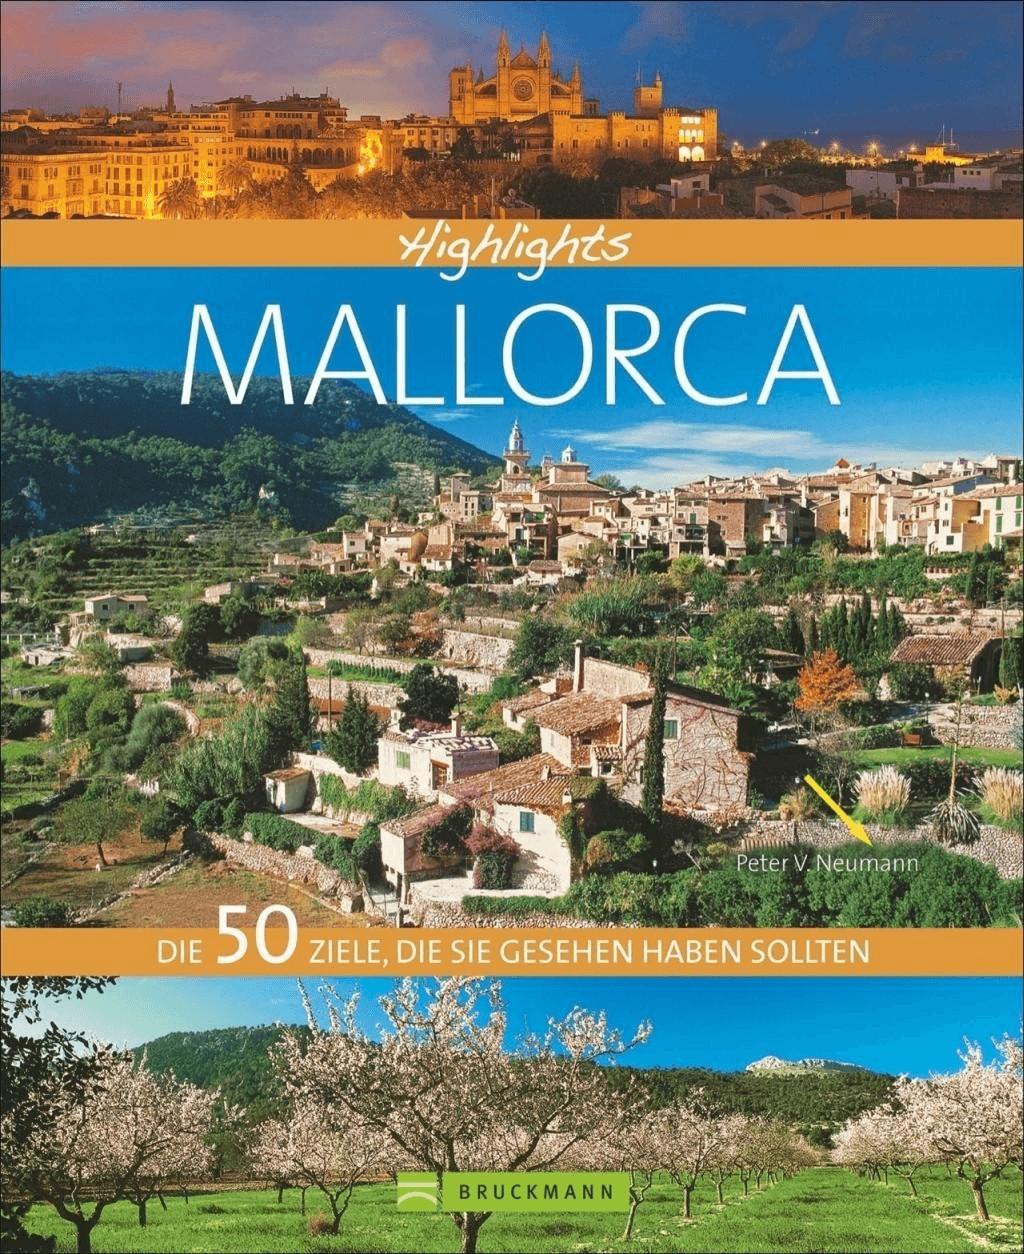 Highlights Mallorca [Gebundene Ausgabe]